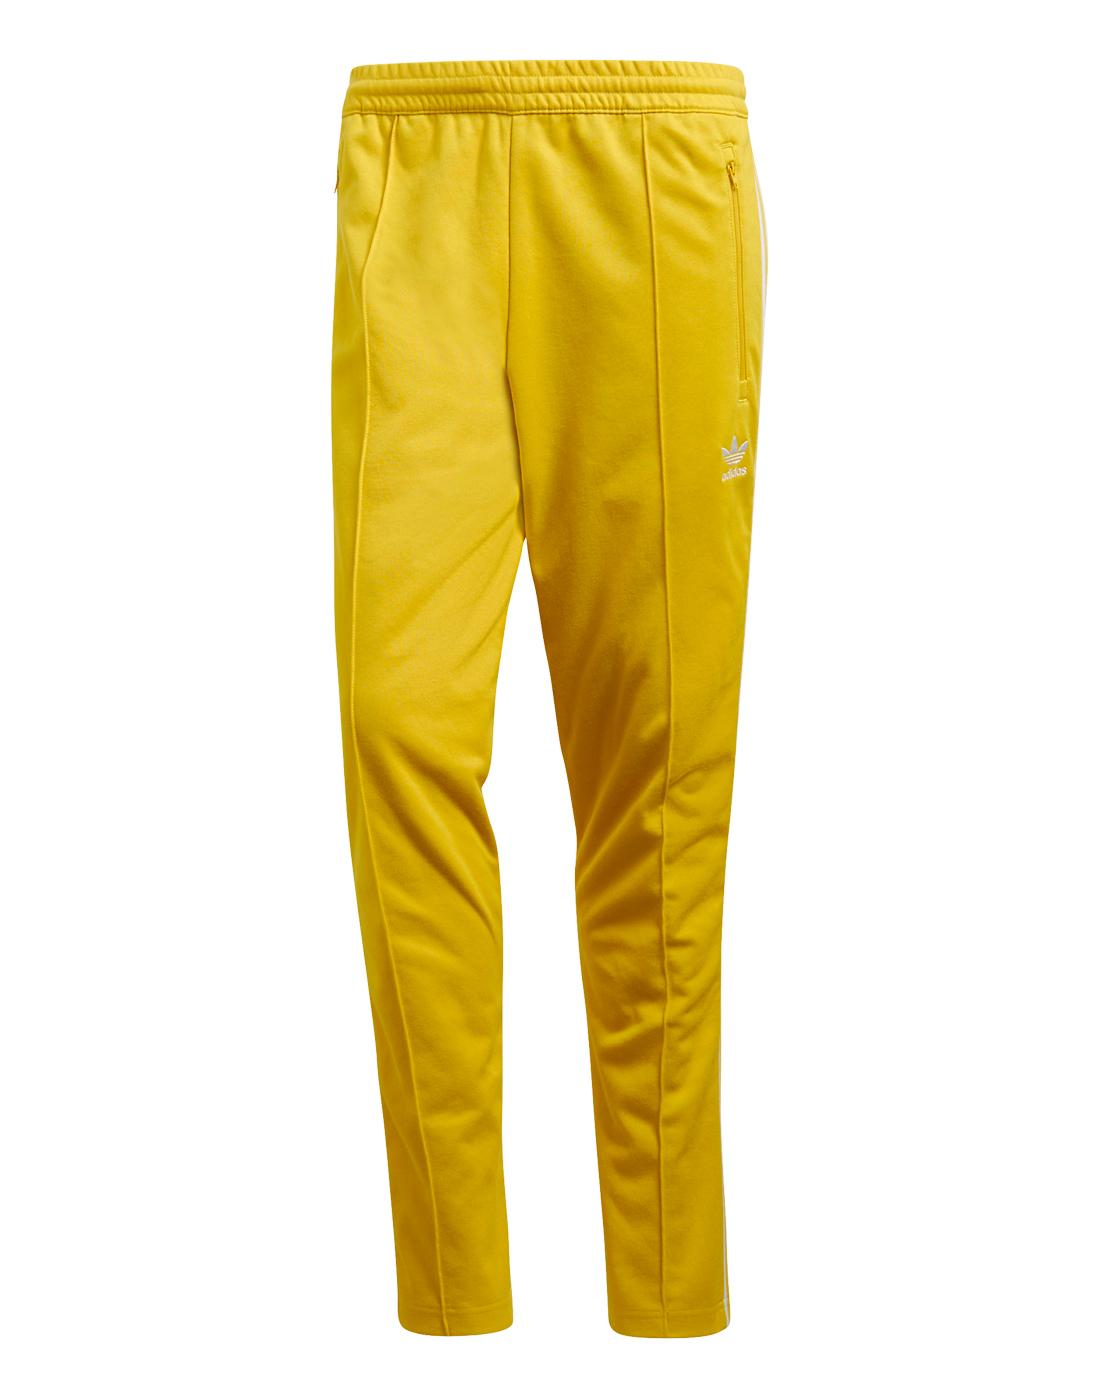 b3ceff620c07 Men s Yellow adidas Originals Beckenbauer Track Pants